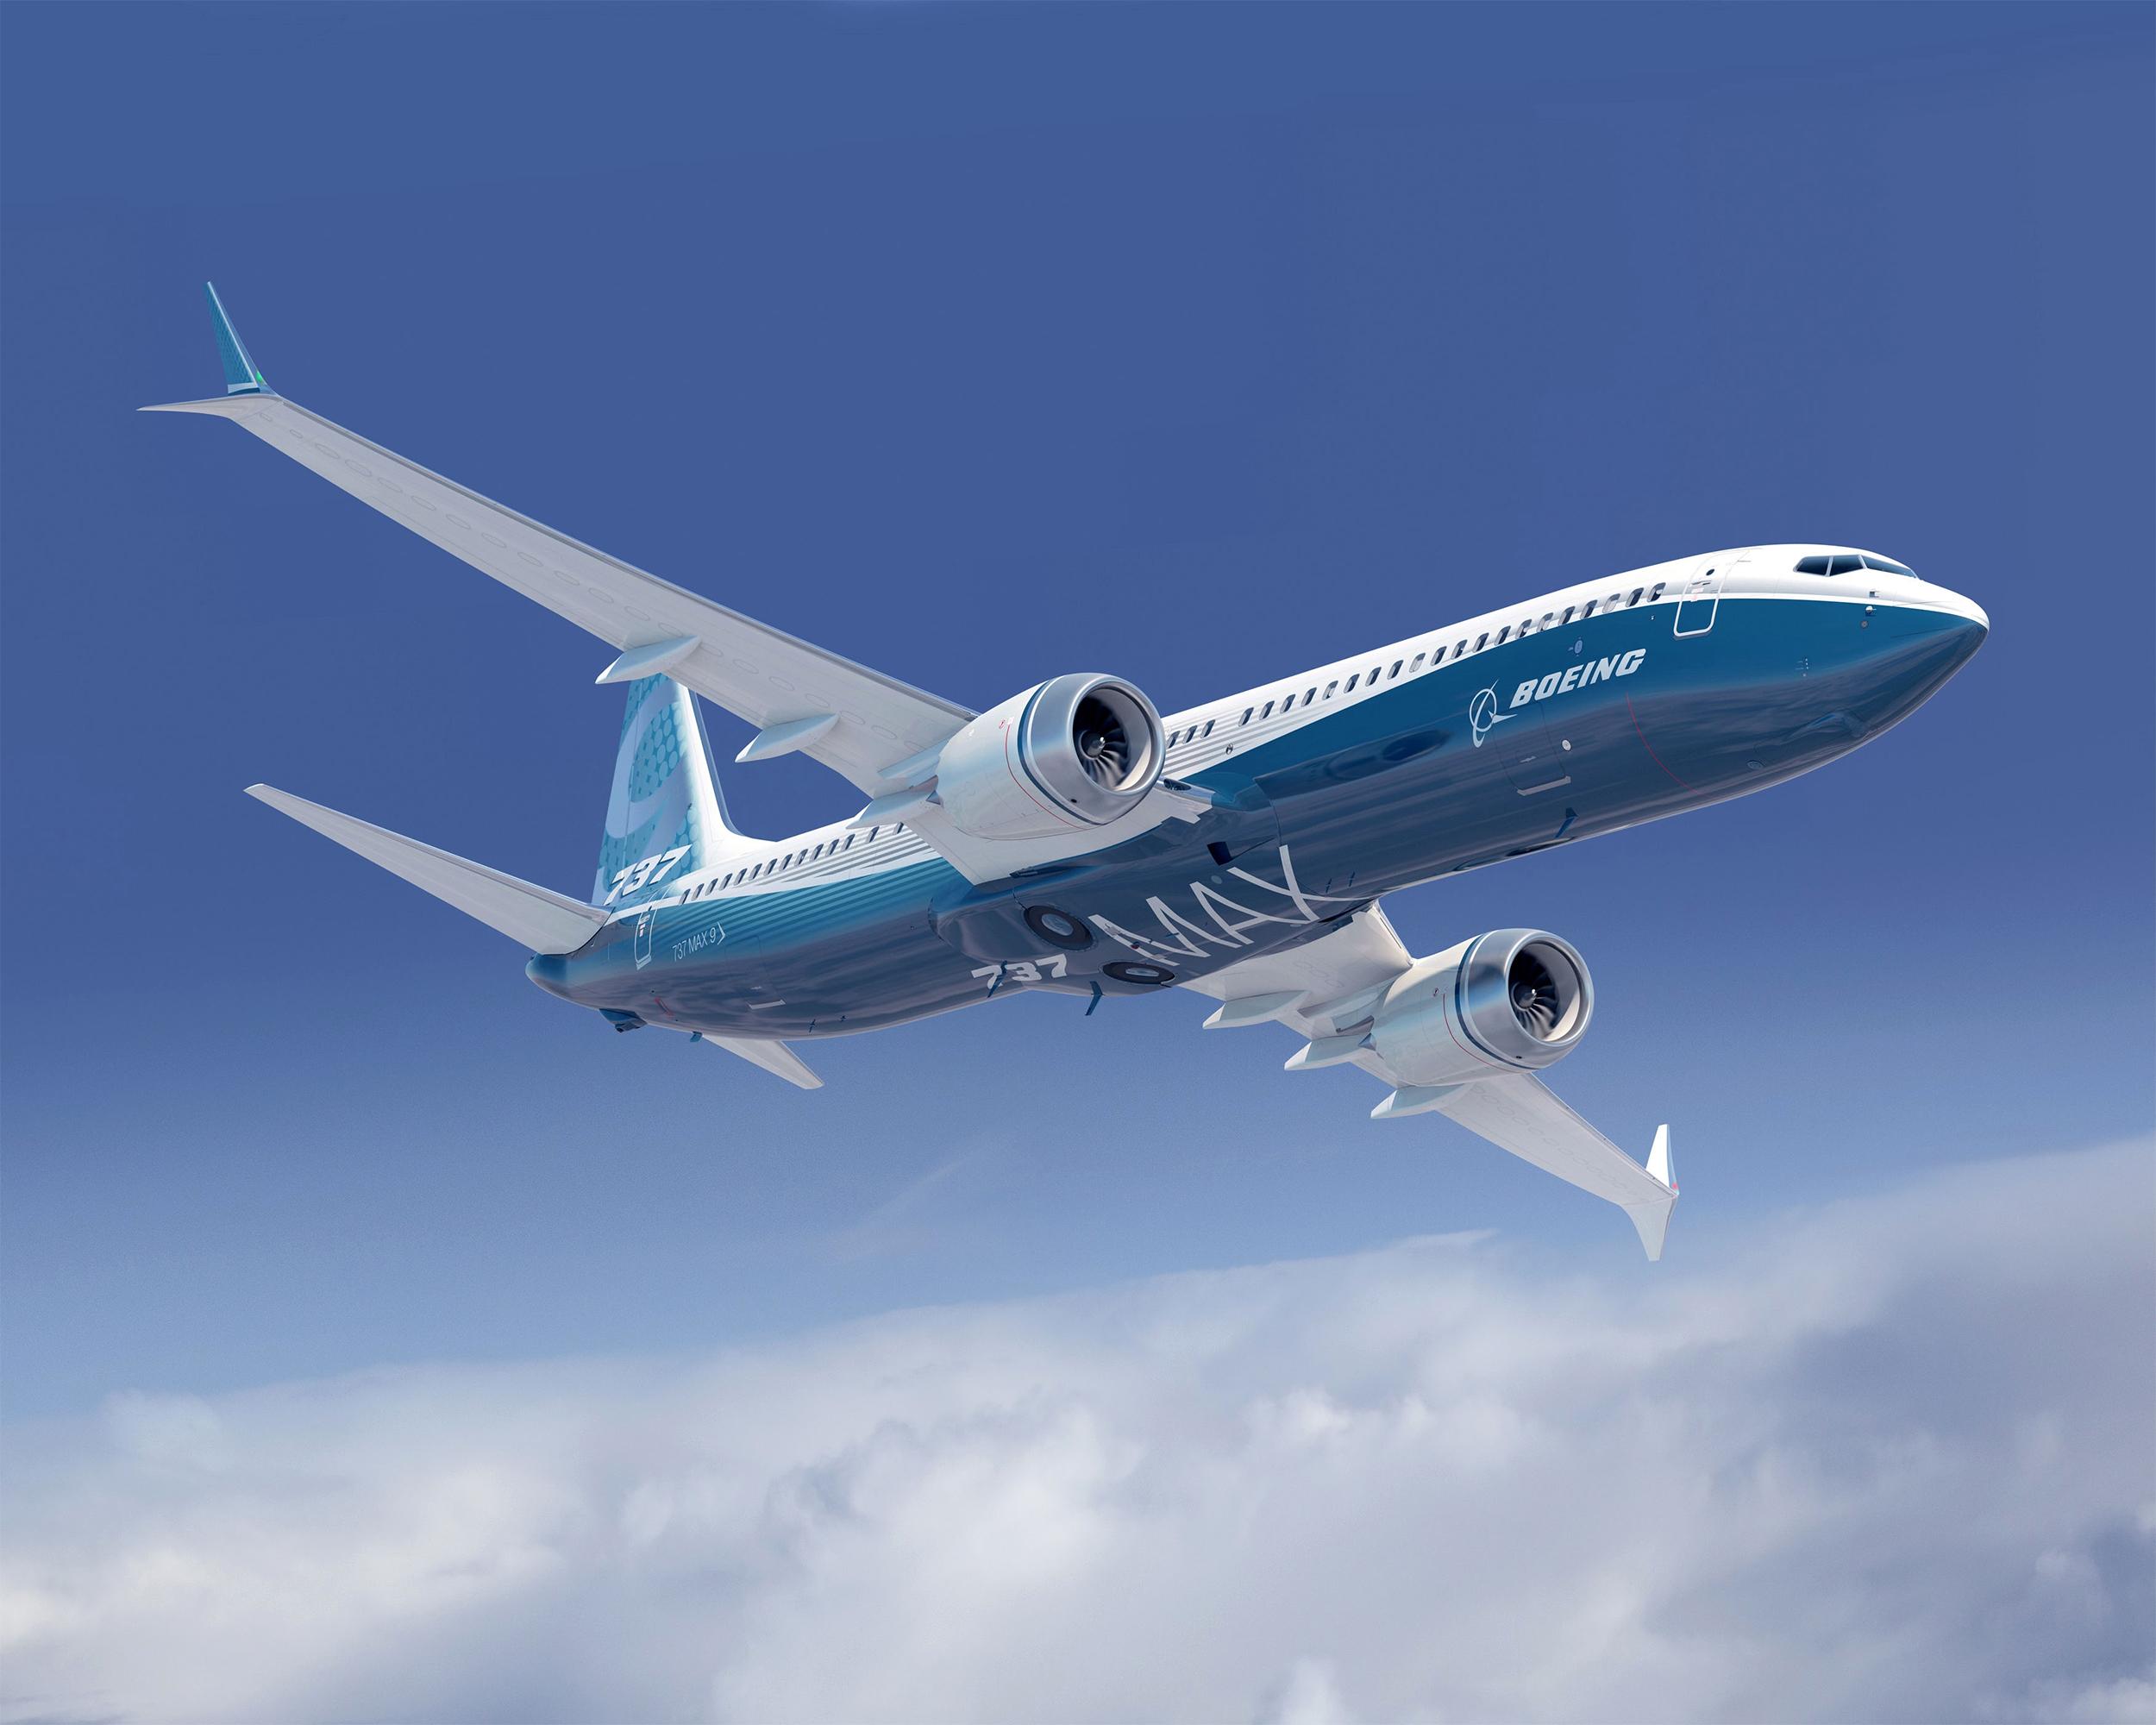 737 MAX 9 (Boeing)